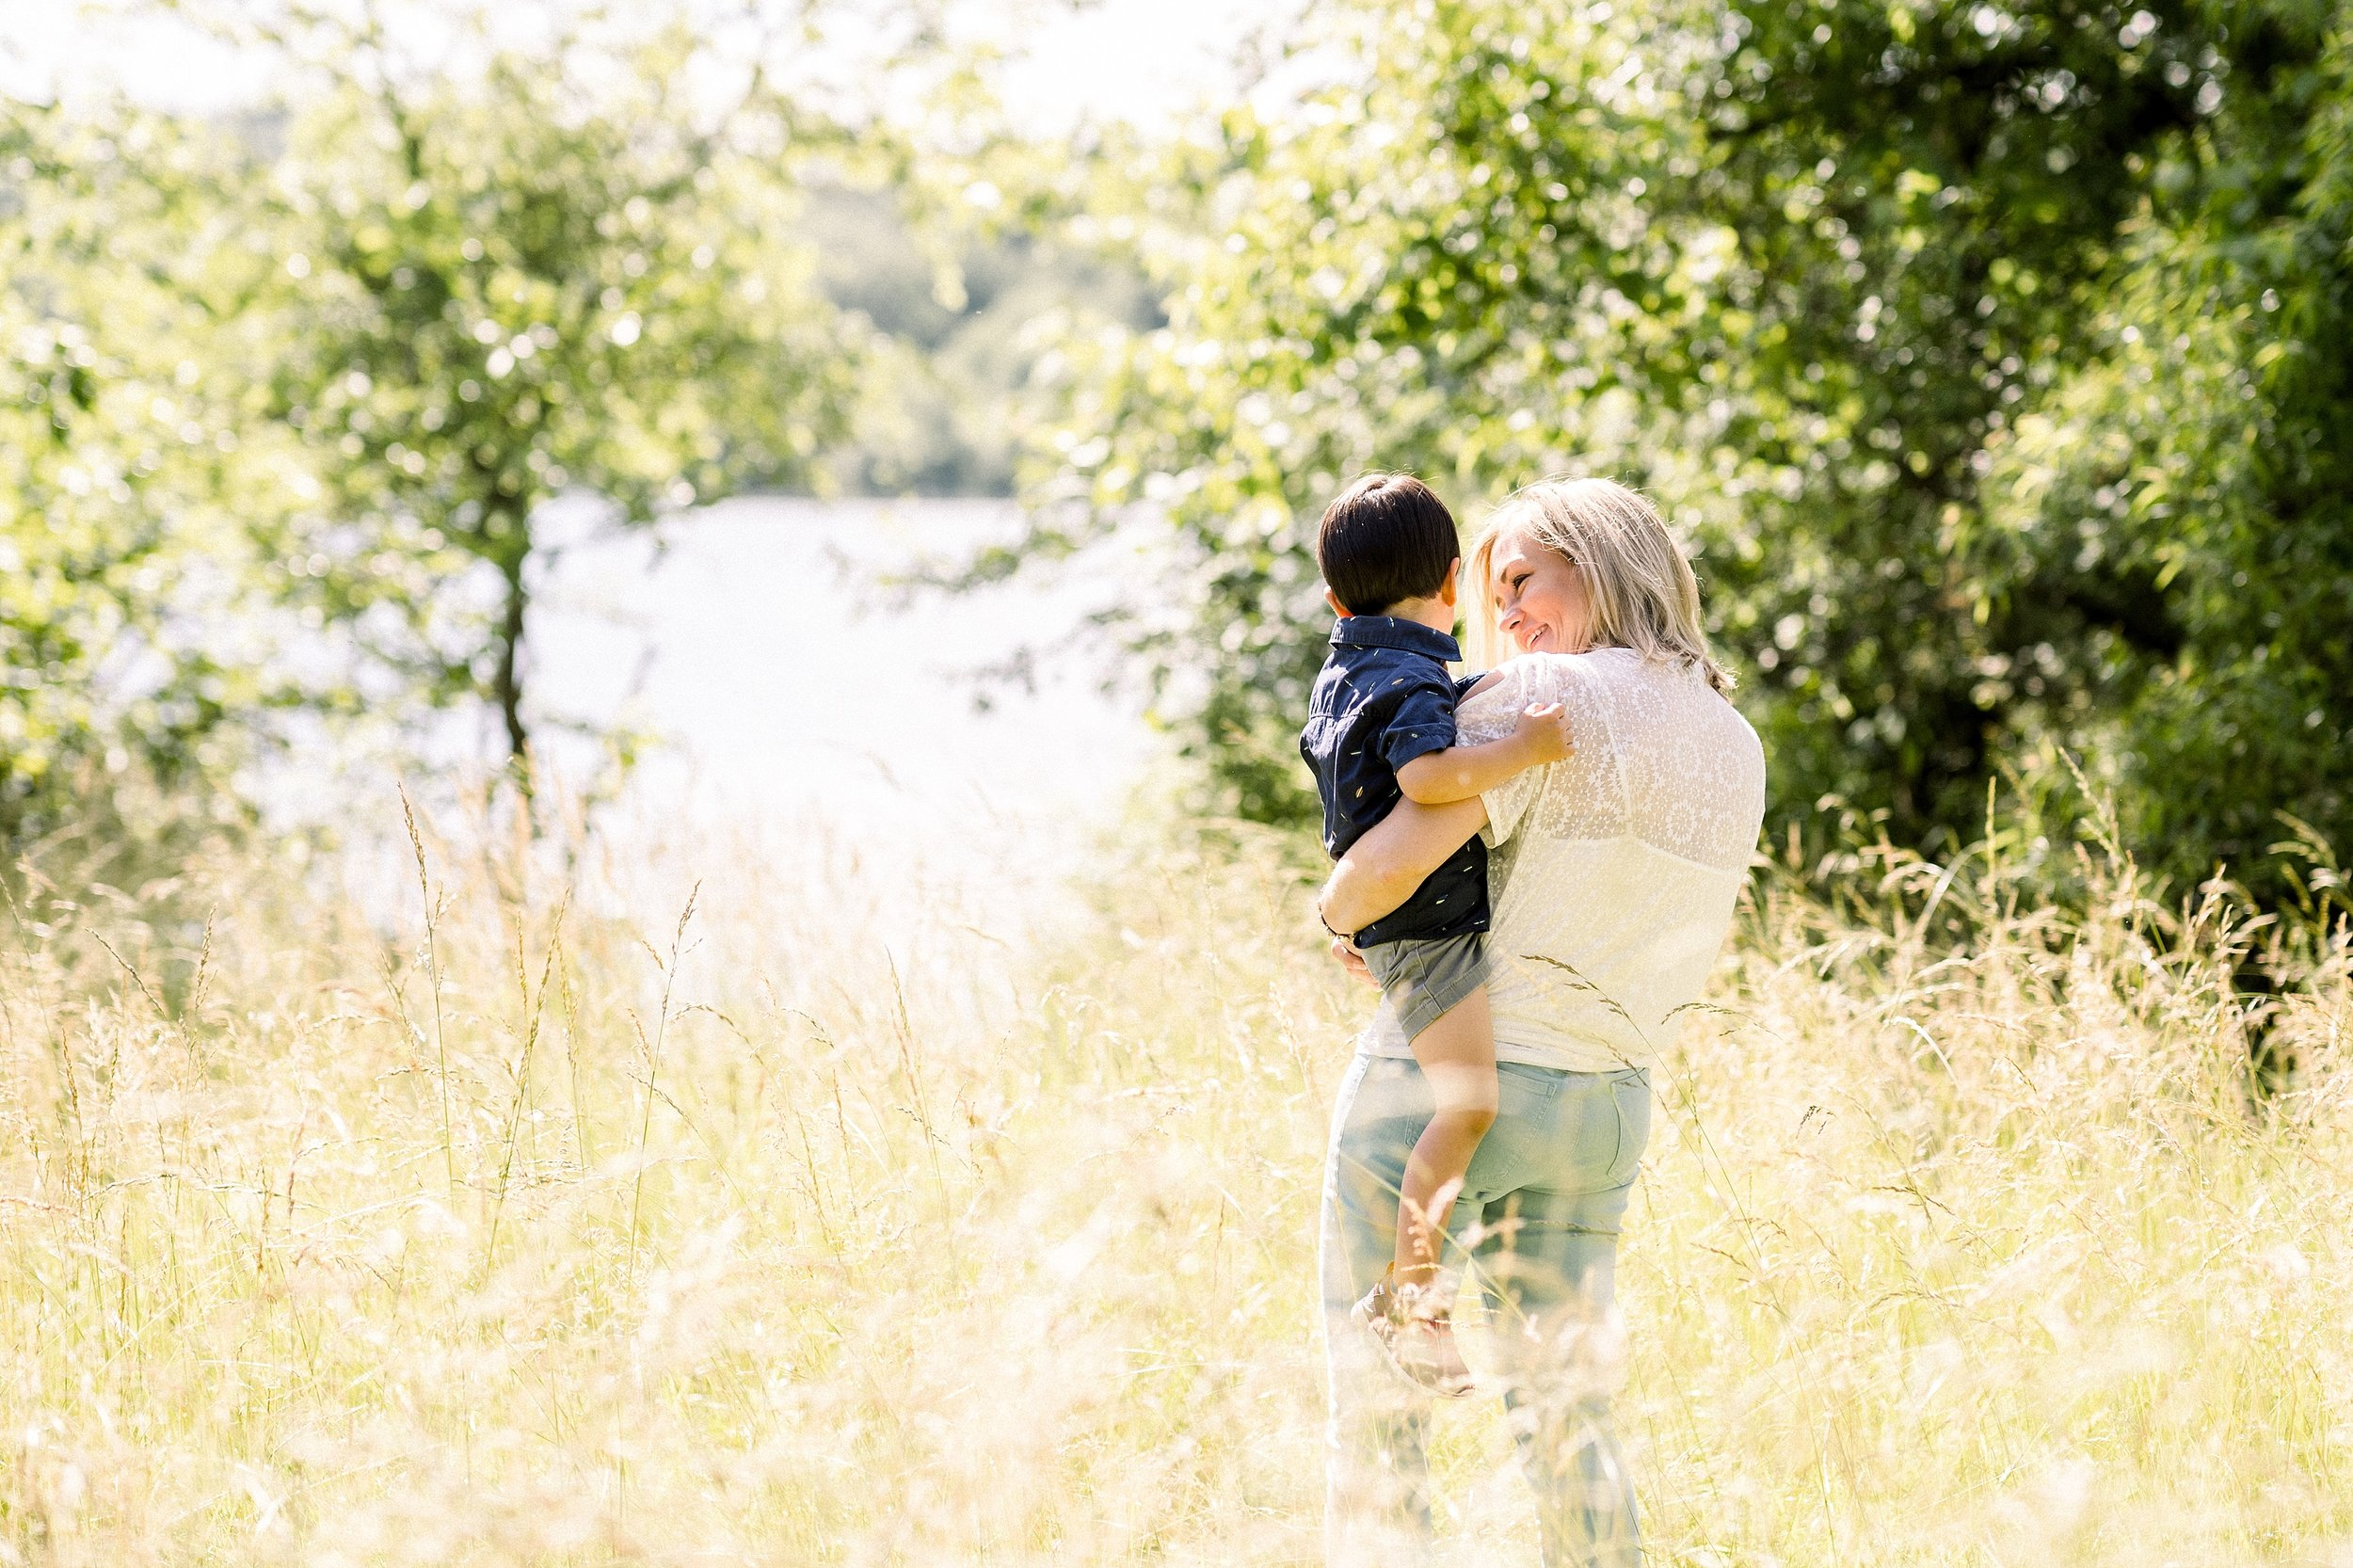 Bucks-County-Family-Photographer_0020.jpg